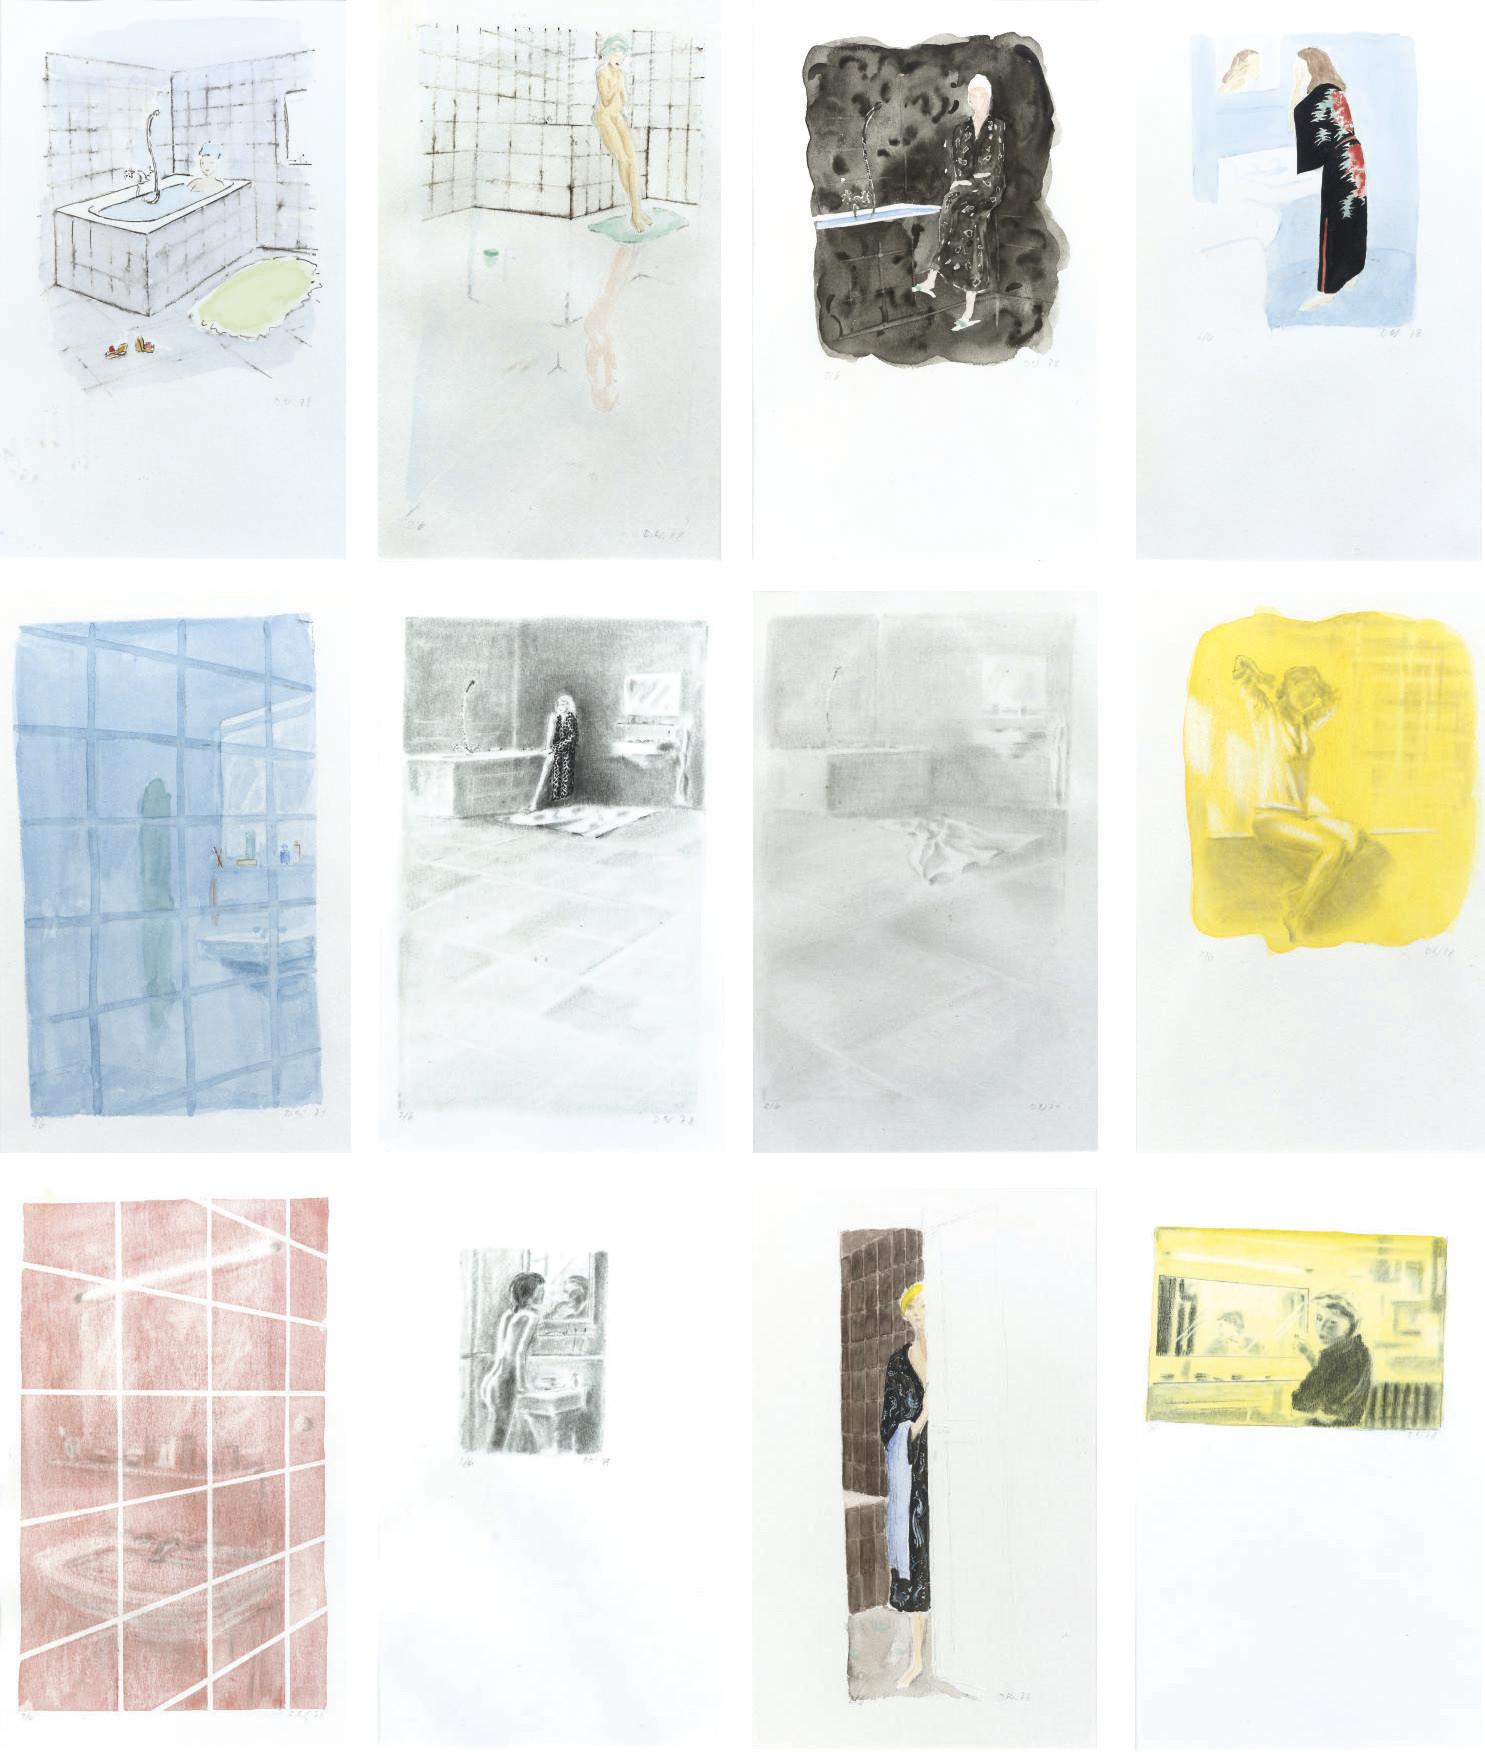 Badezimmer - 12 watercolours